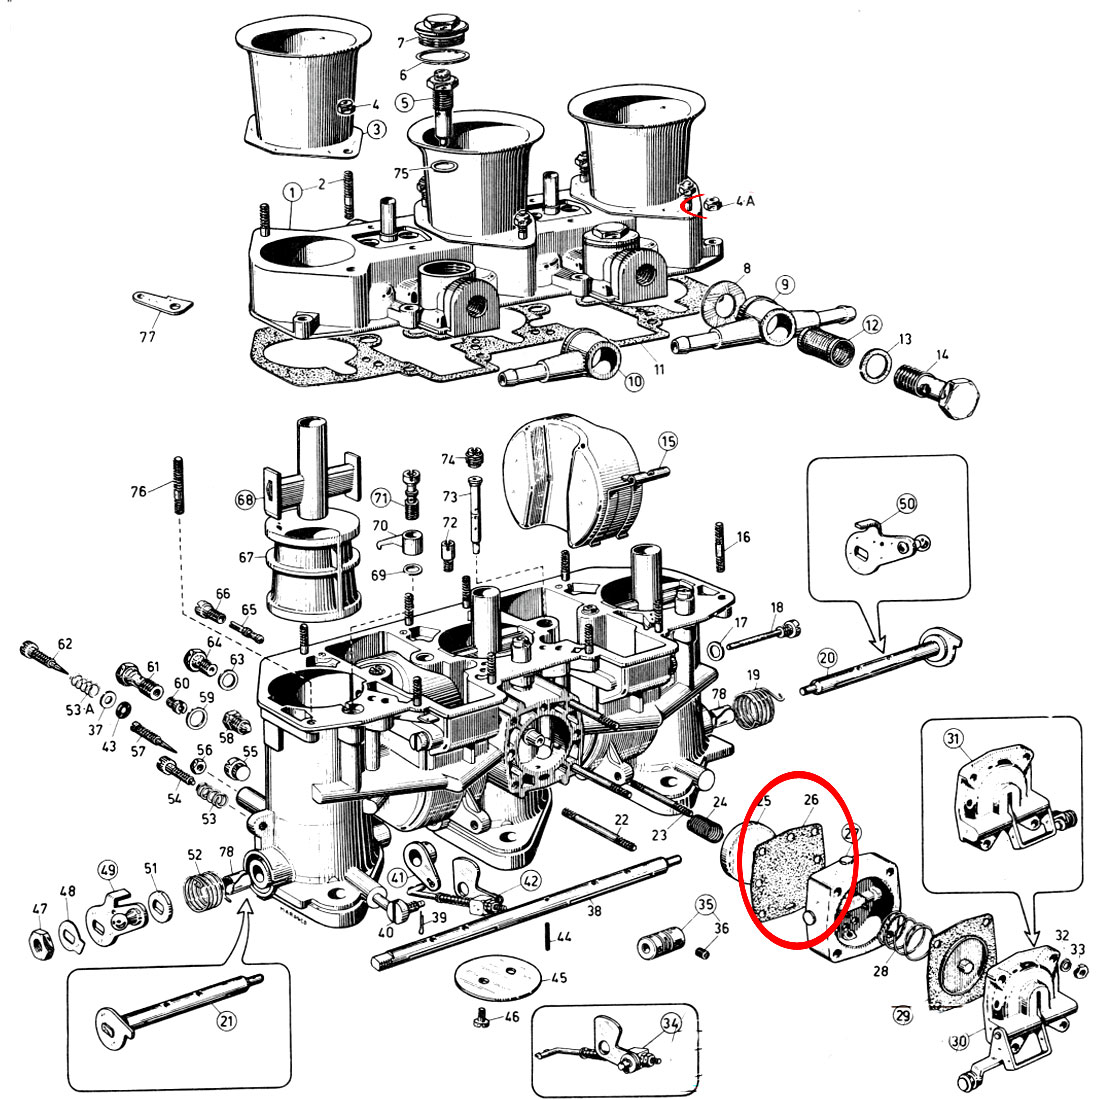 medium resolution of ford motorcraft carburetors imageresizertool com ford 2100 carburetor vacuum diagram motorcraft 2100 carburetor diagram